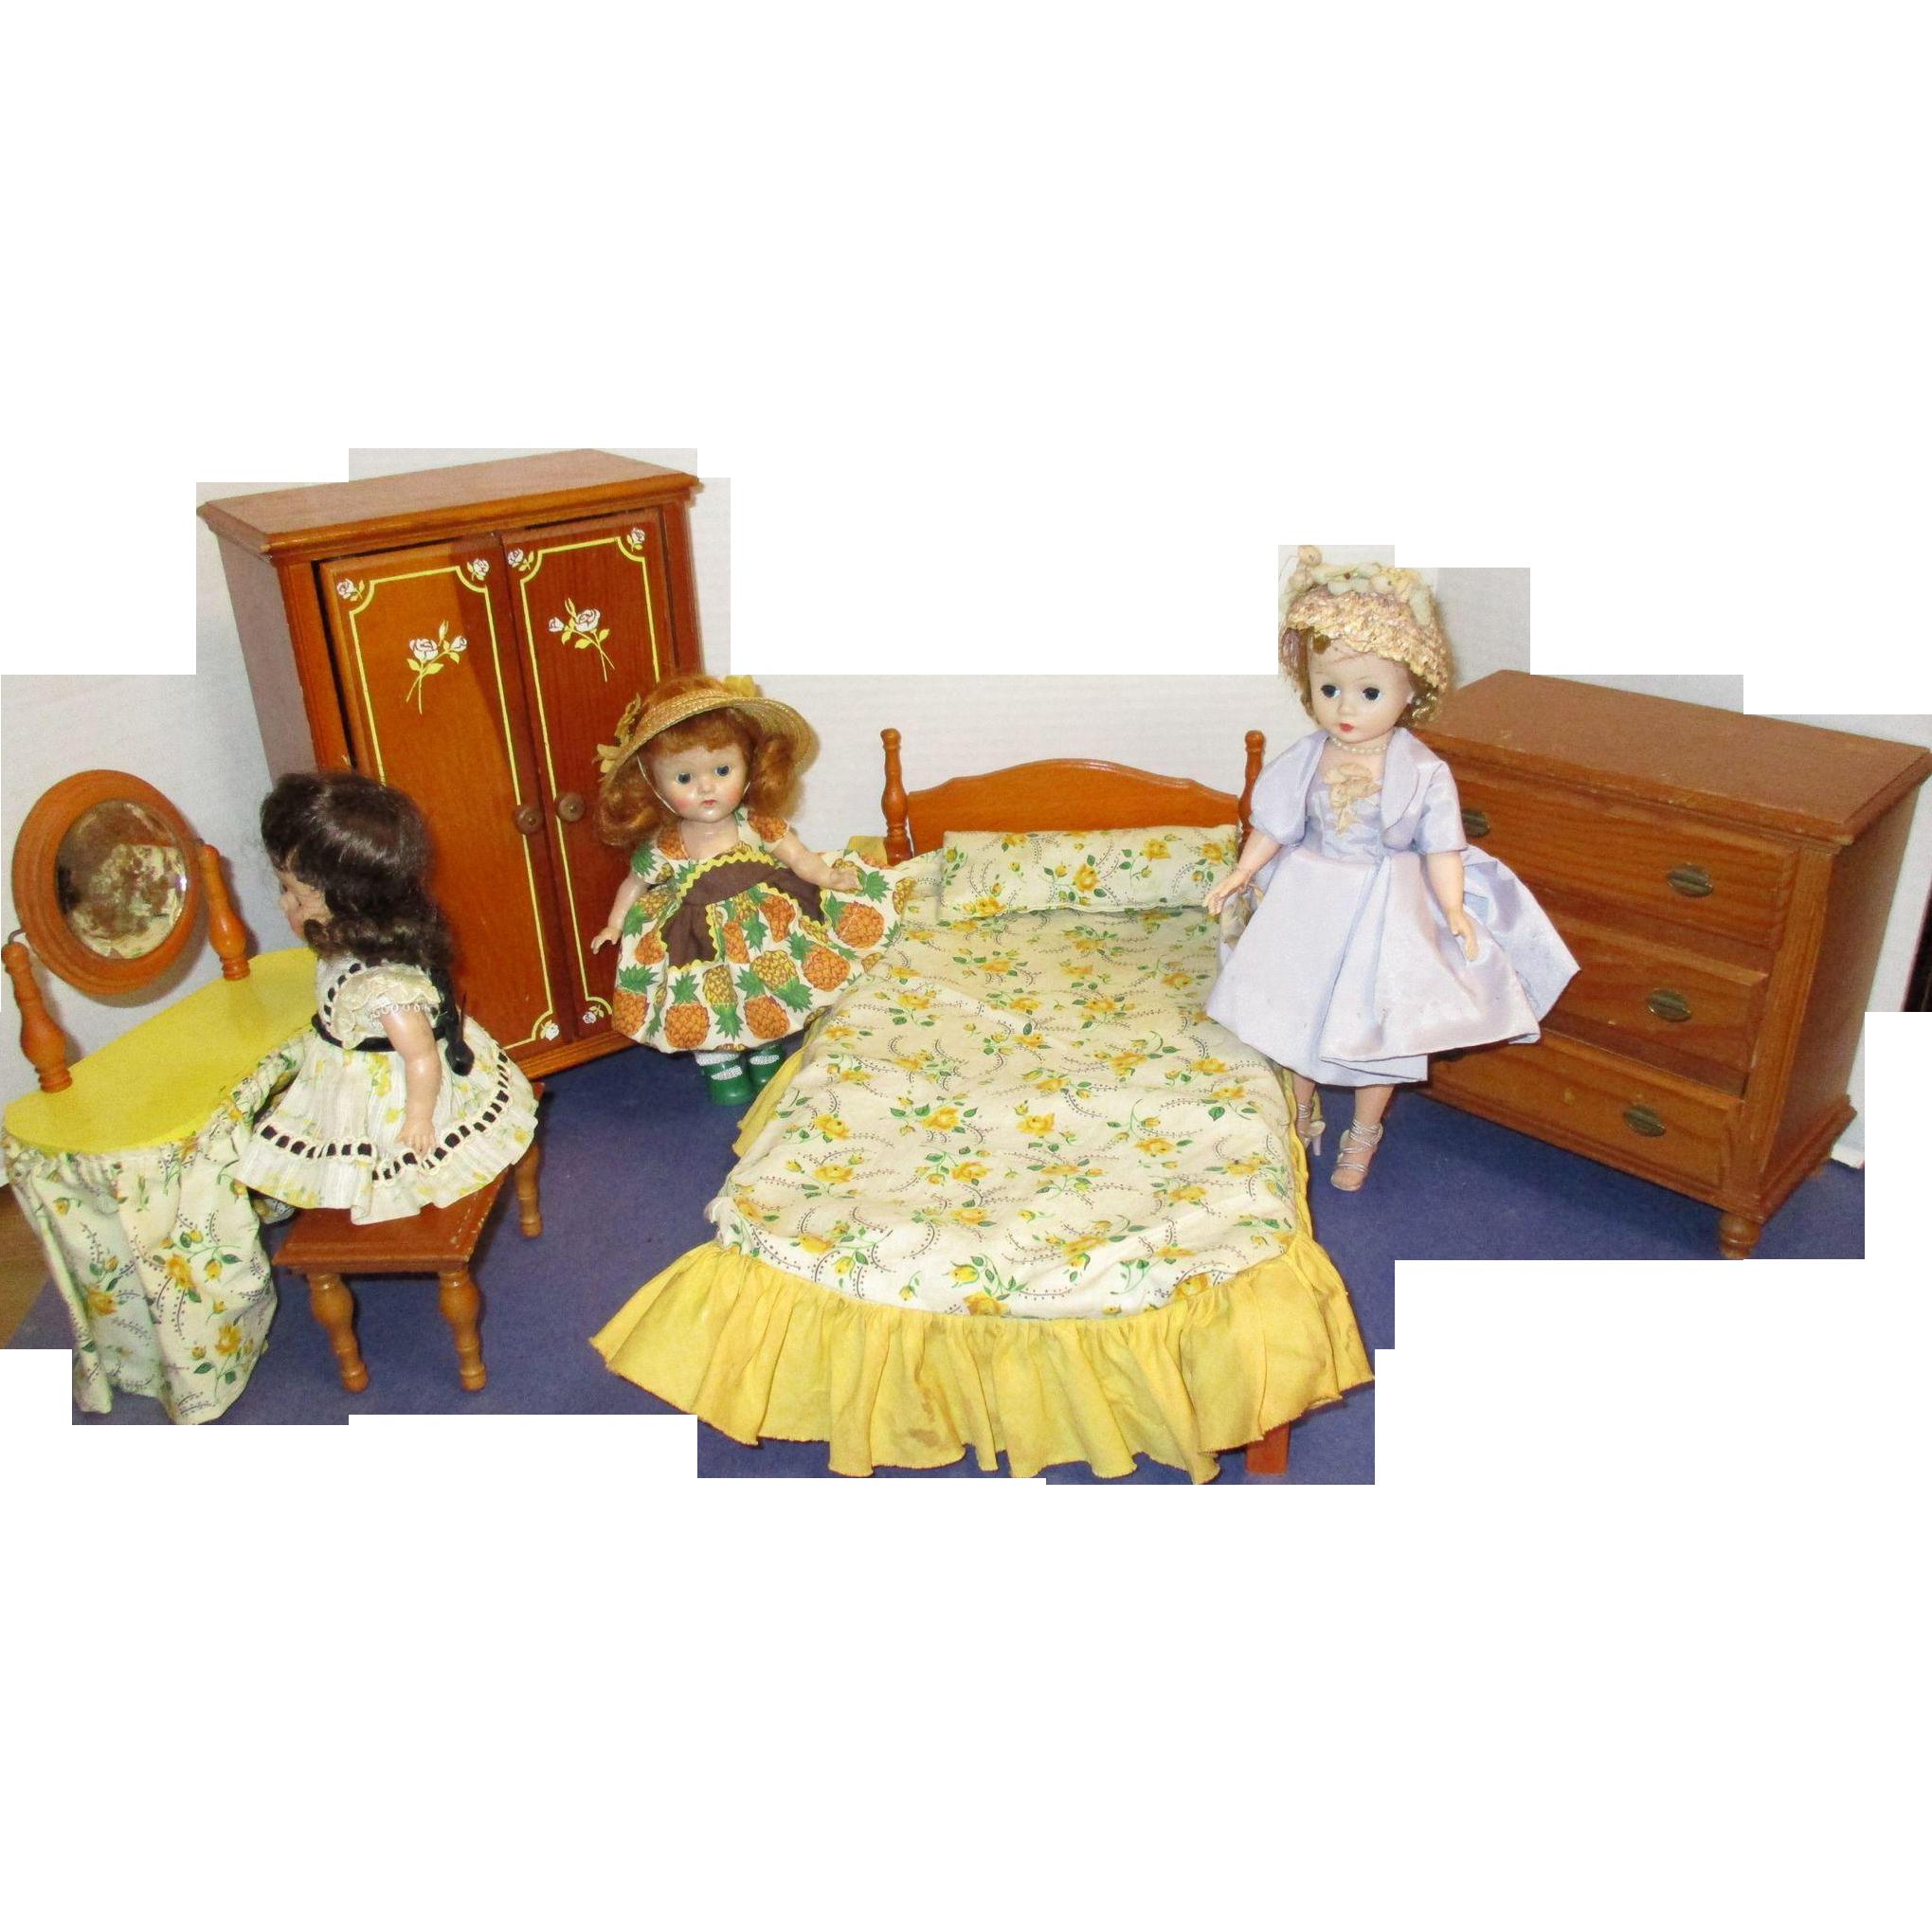 Vintage keystone wooden bedroom furniture set wooden bedroom